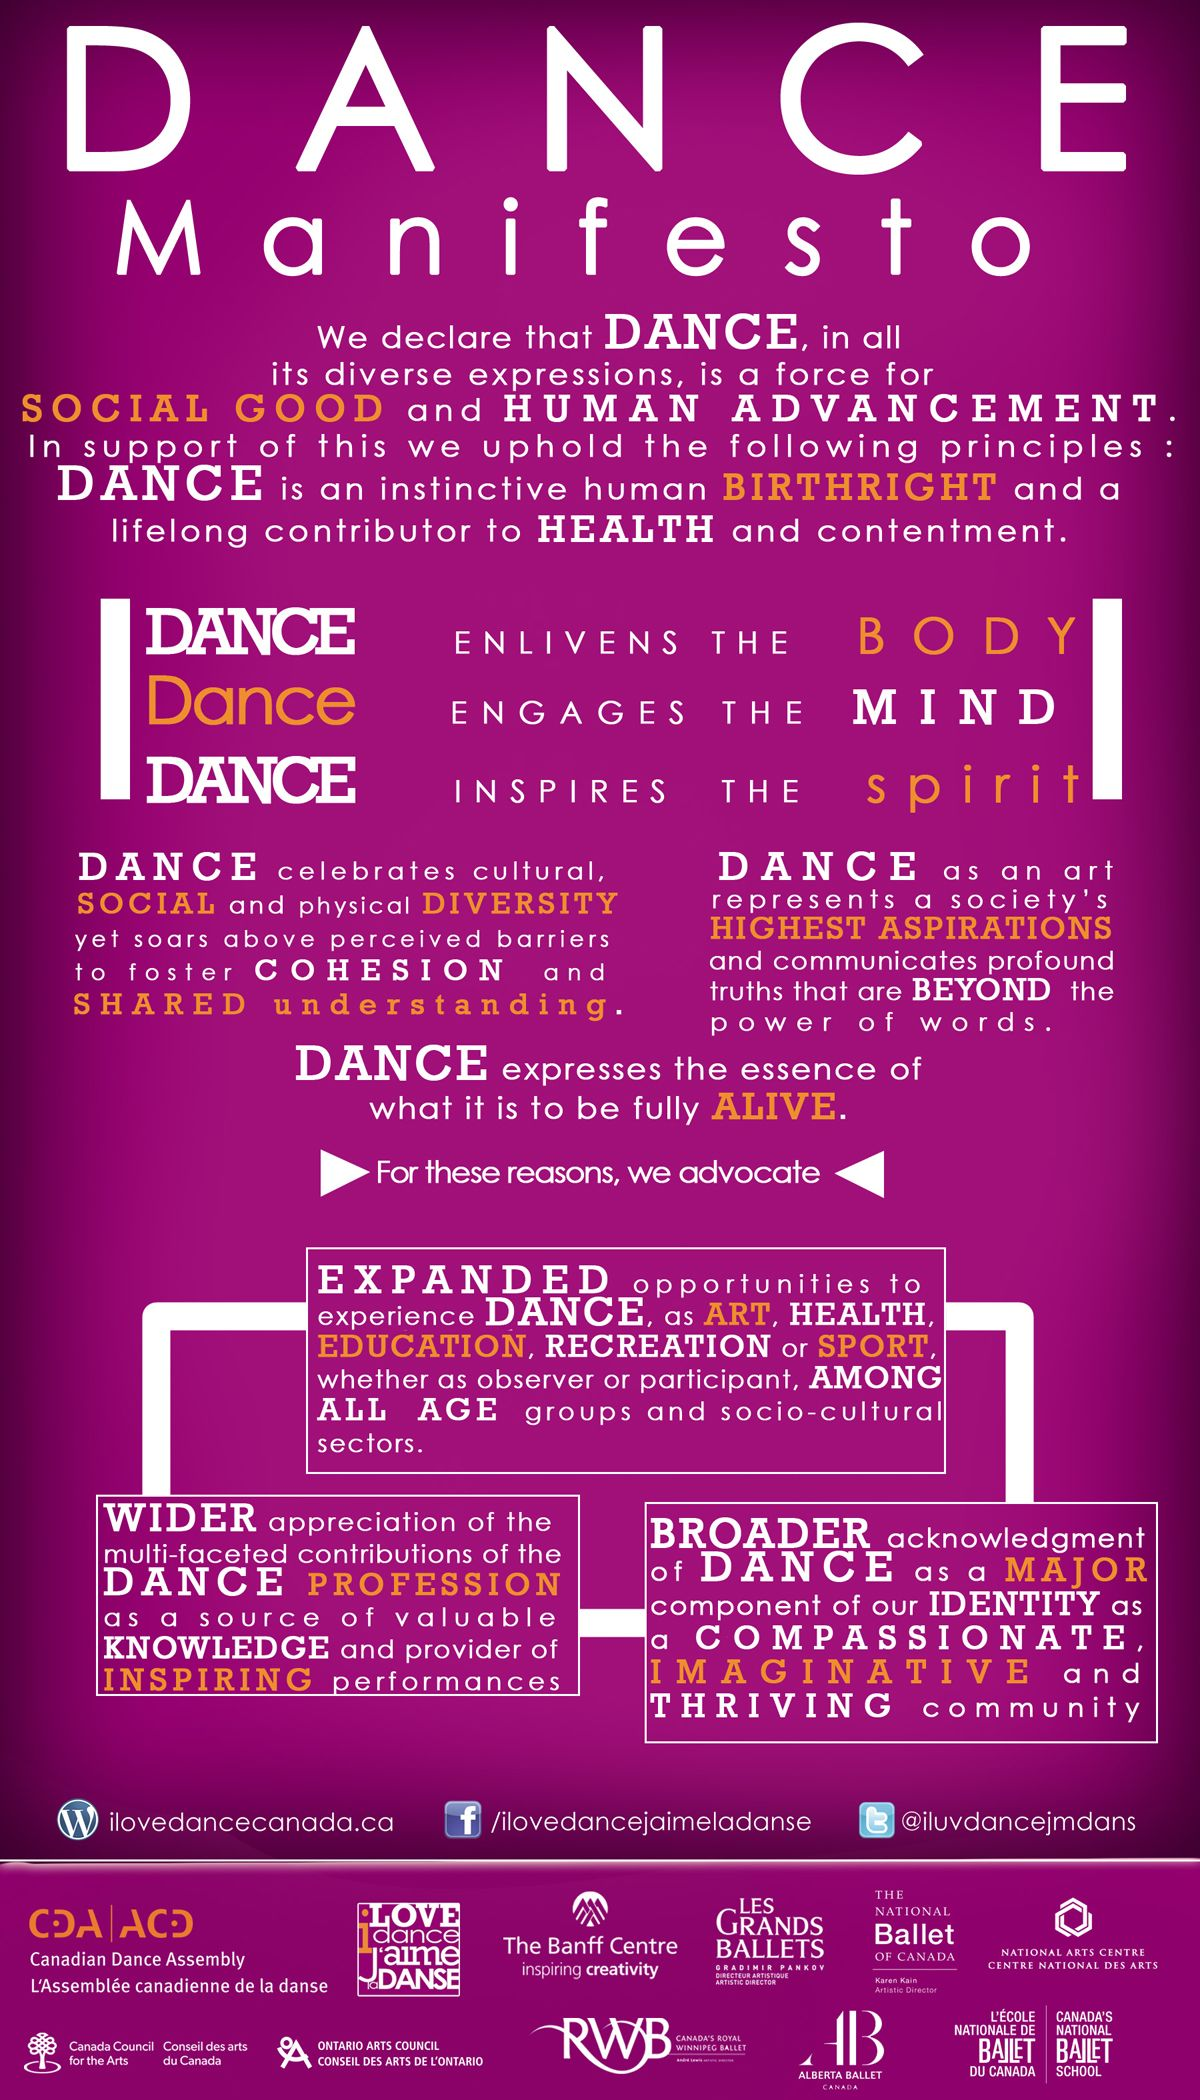 Canadian Dance Manifesto